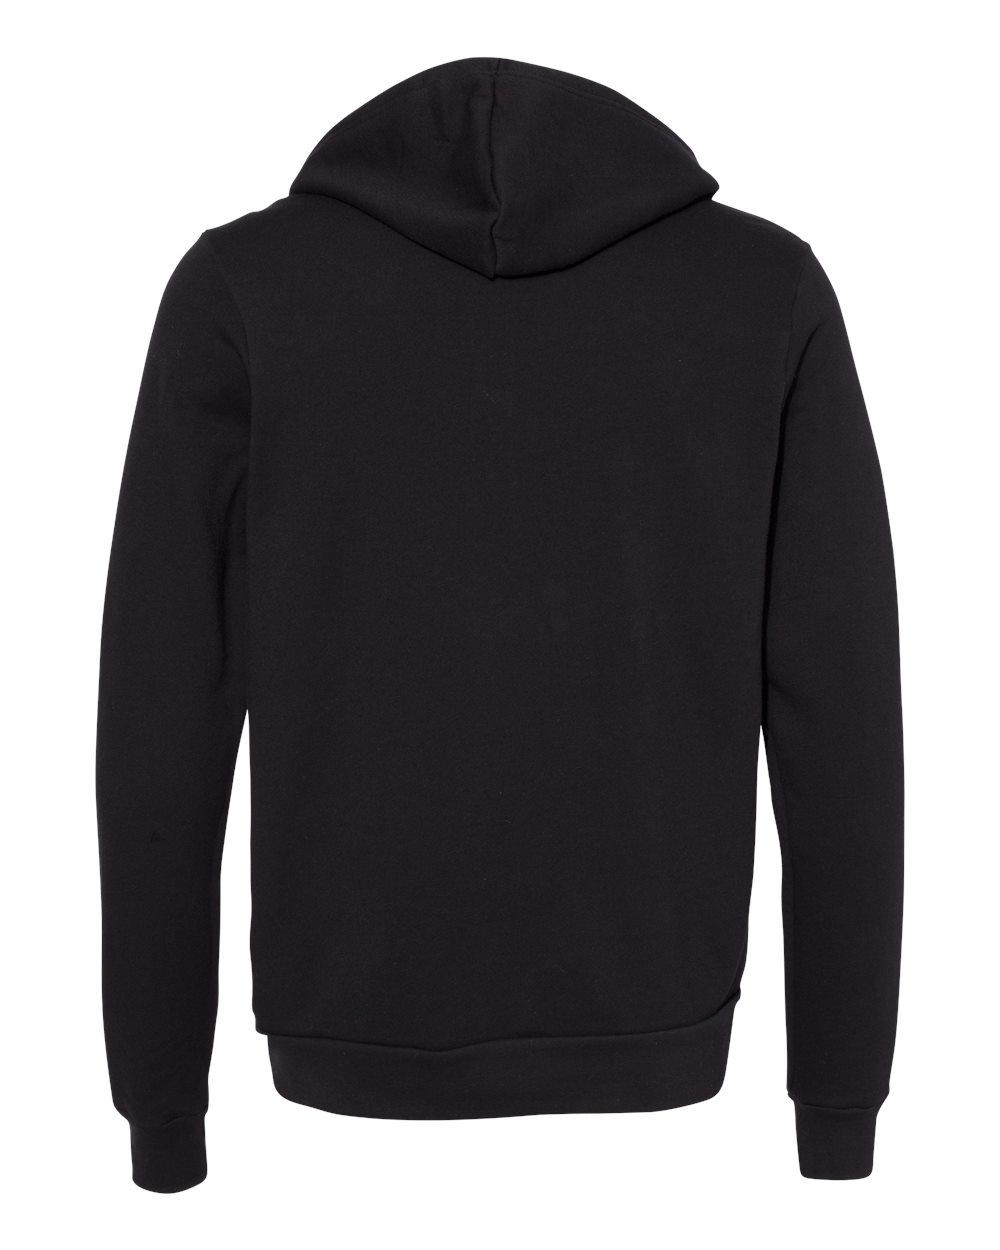 Bella-Canvas-Unisex-Full-Zip-Up-Hooded-Sweatshirt-Blank-Hoodie-3739-up-to-3XL thumbnail 25